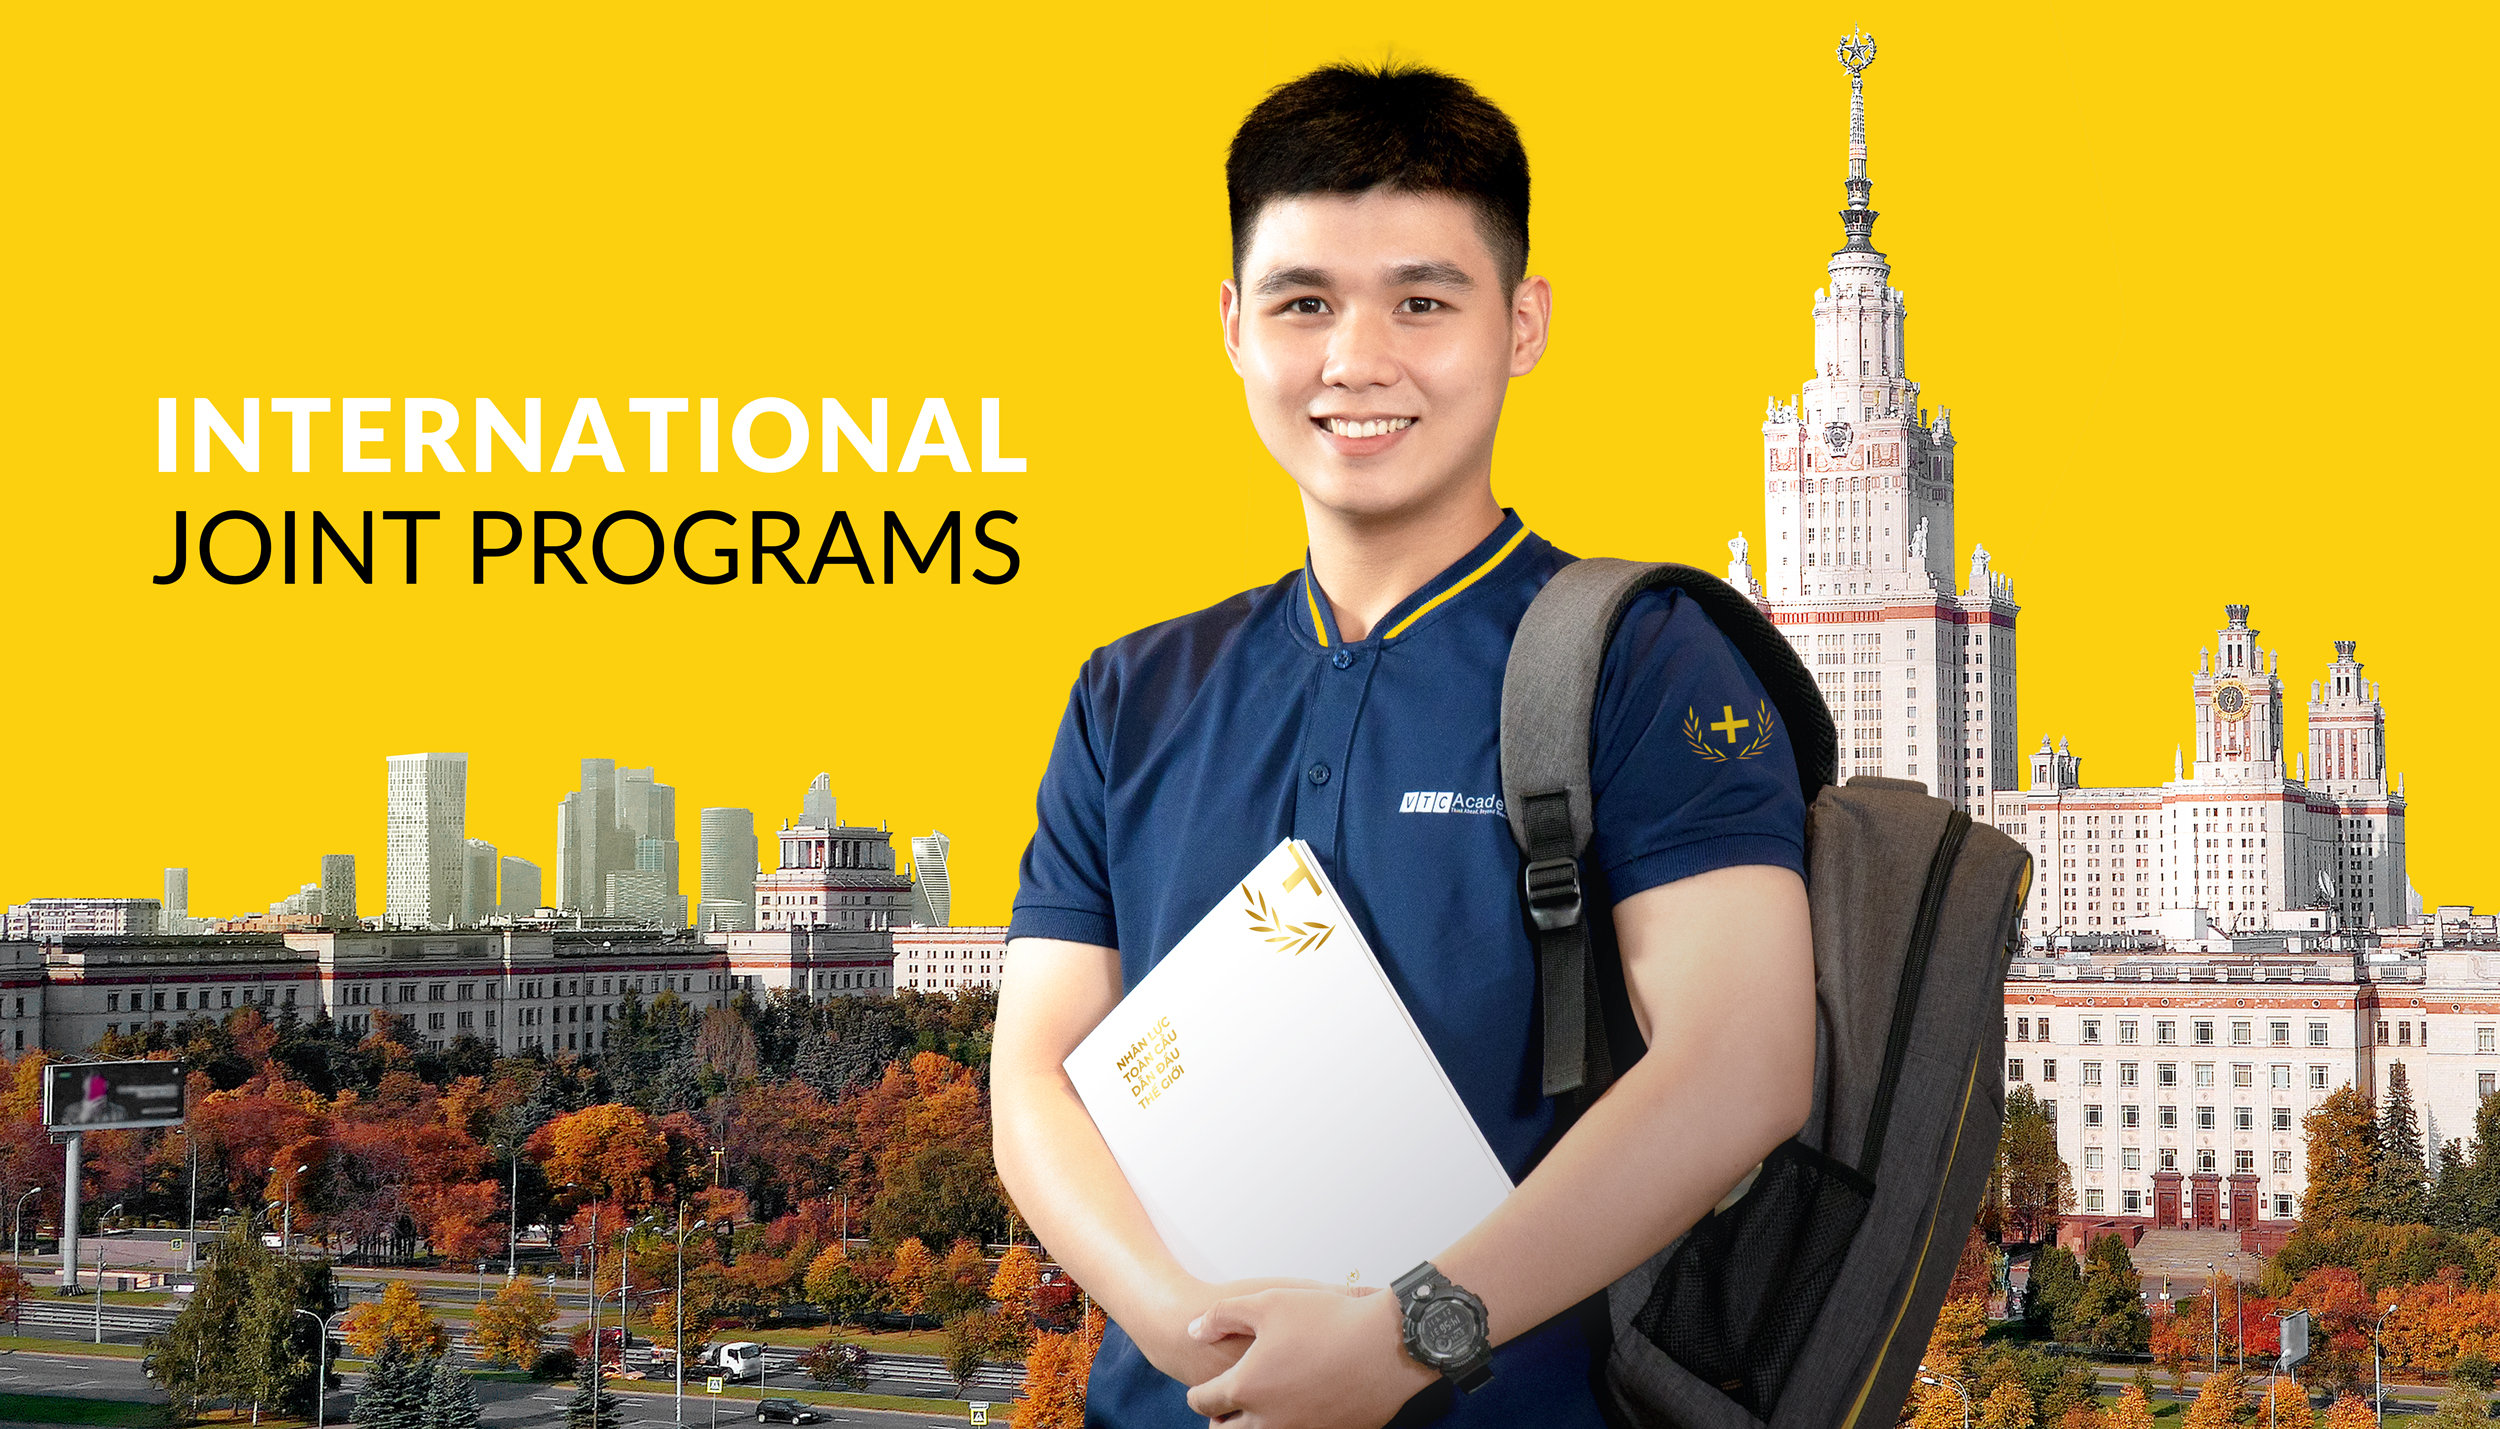 International Joint Programs